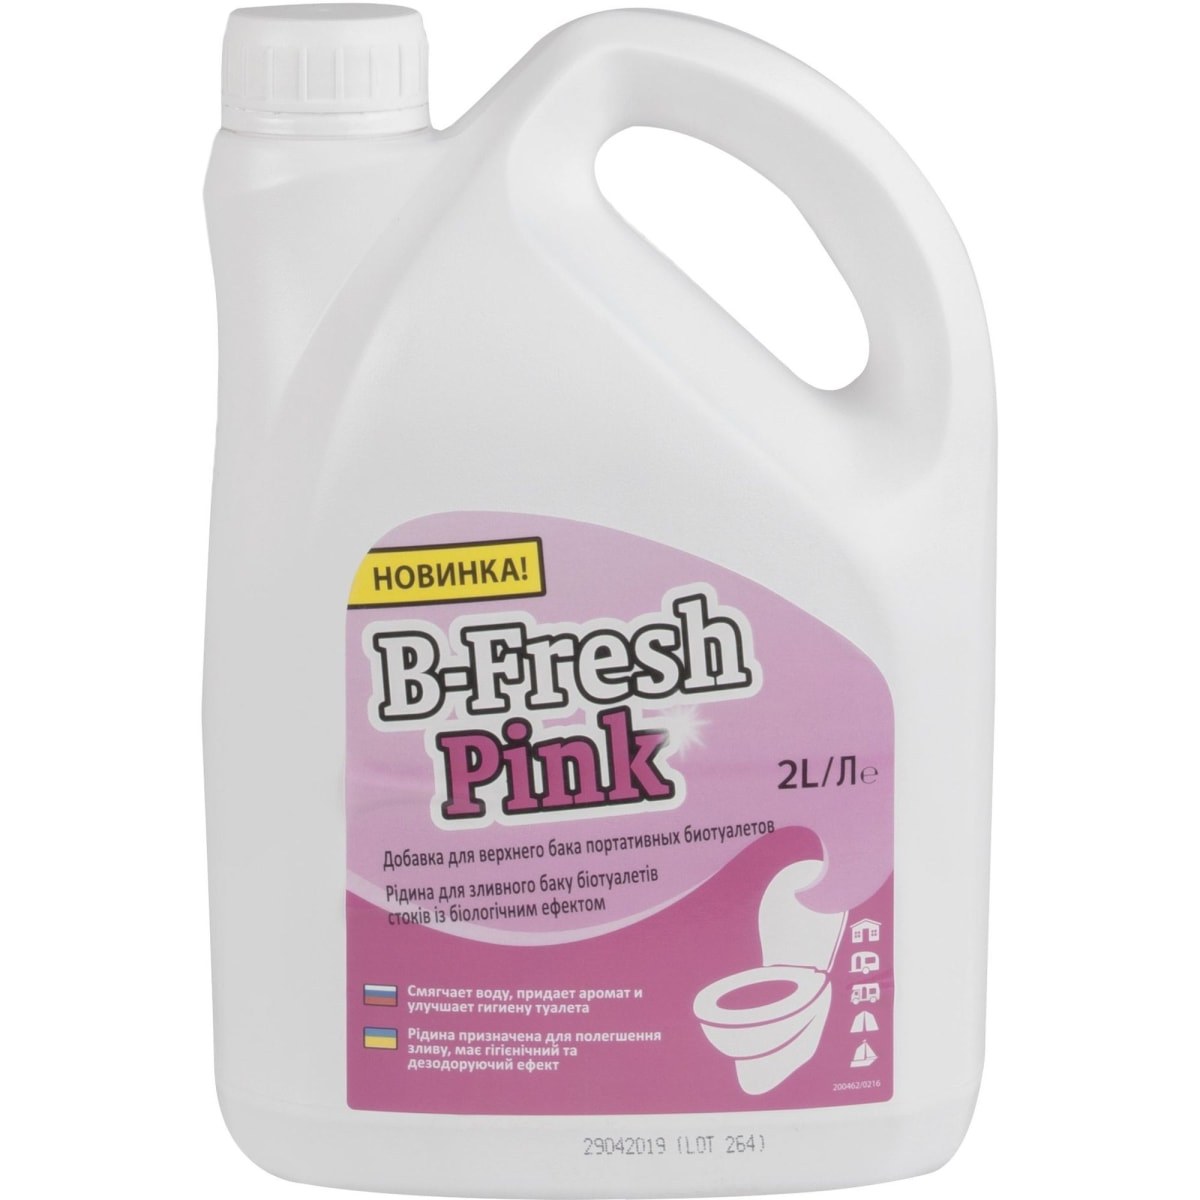 Туалетная жидкость B-Fresh Pink, 2 л